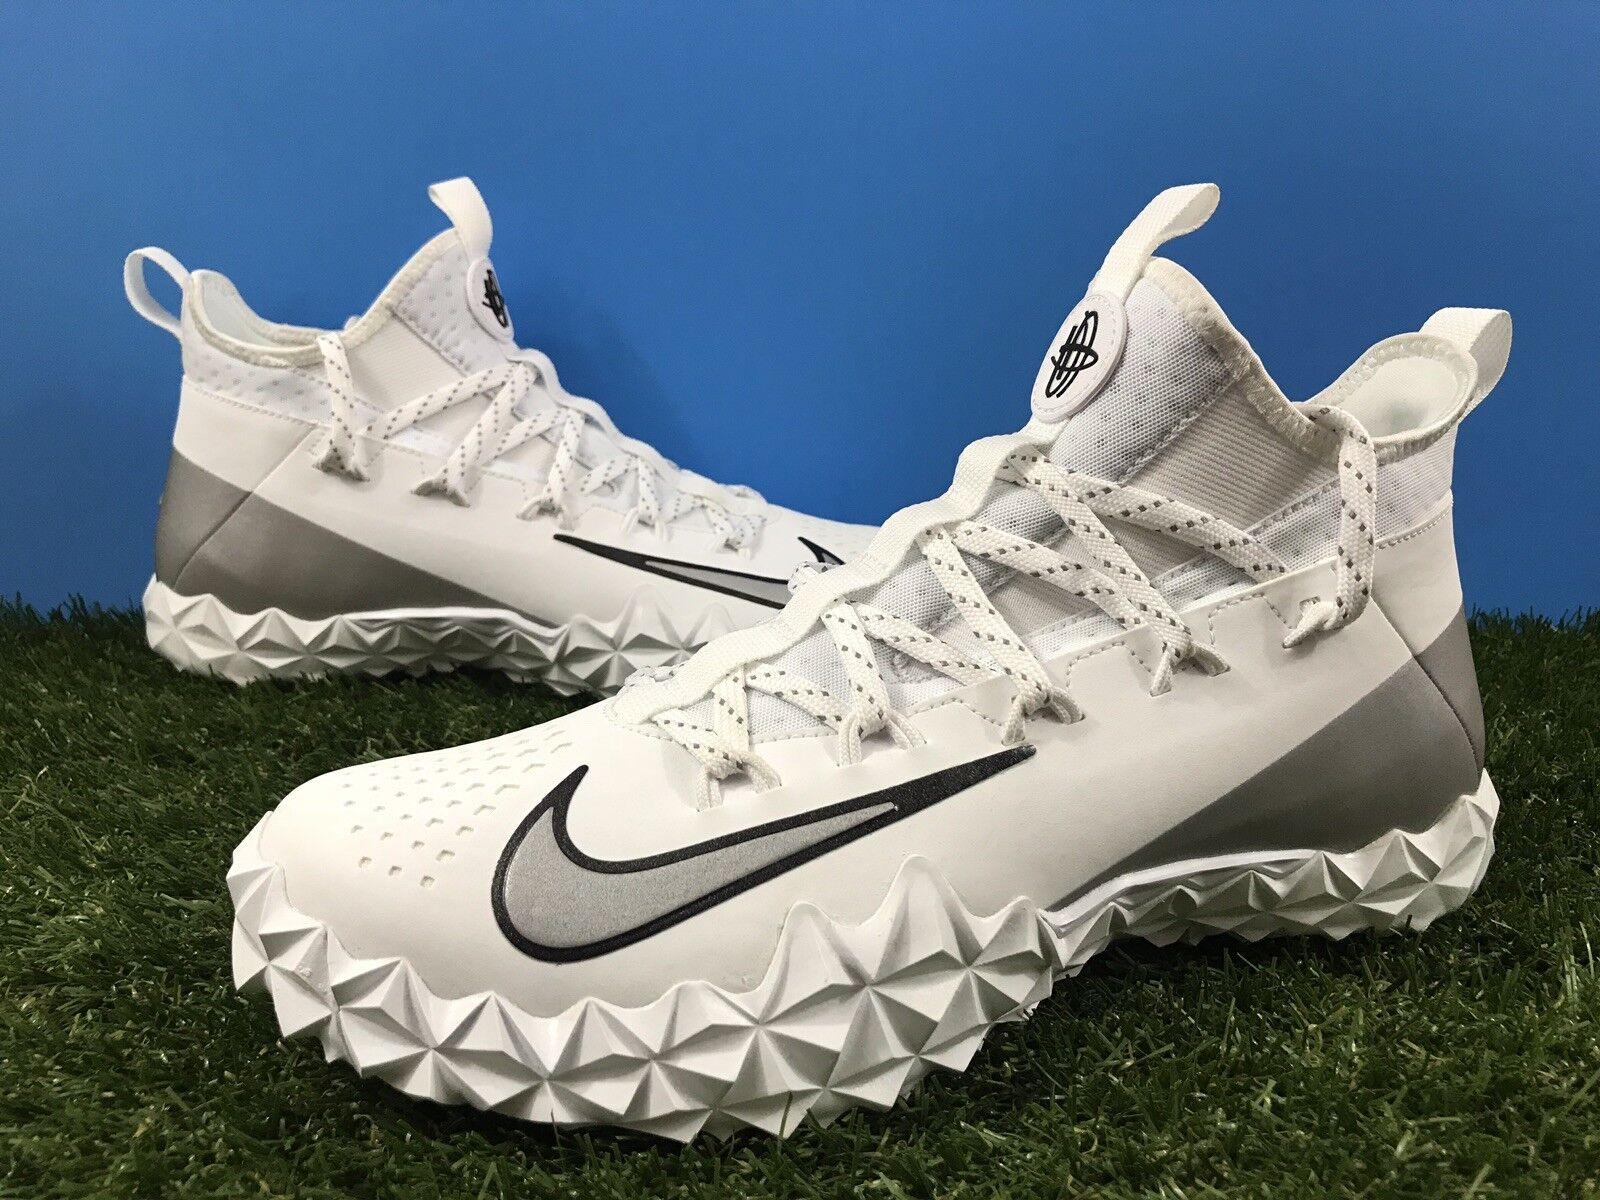 Nike alpha huarache 6 elite territorio aeroporto le scarpe da lacrosse 923426-101 Uomo sz 9,5